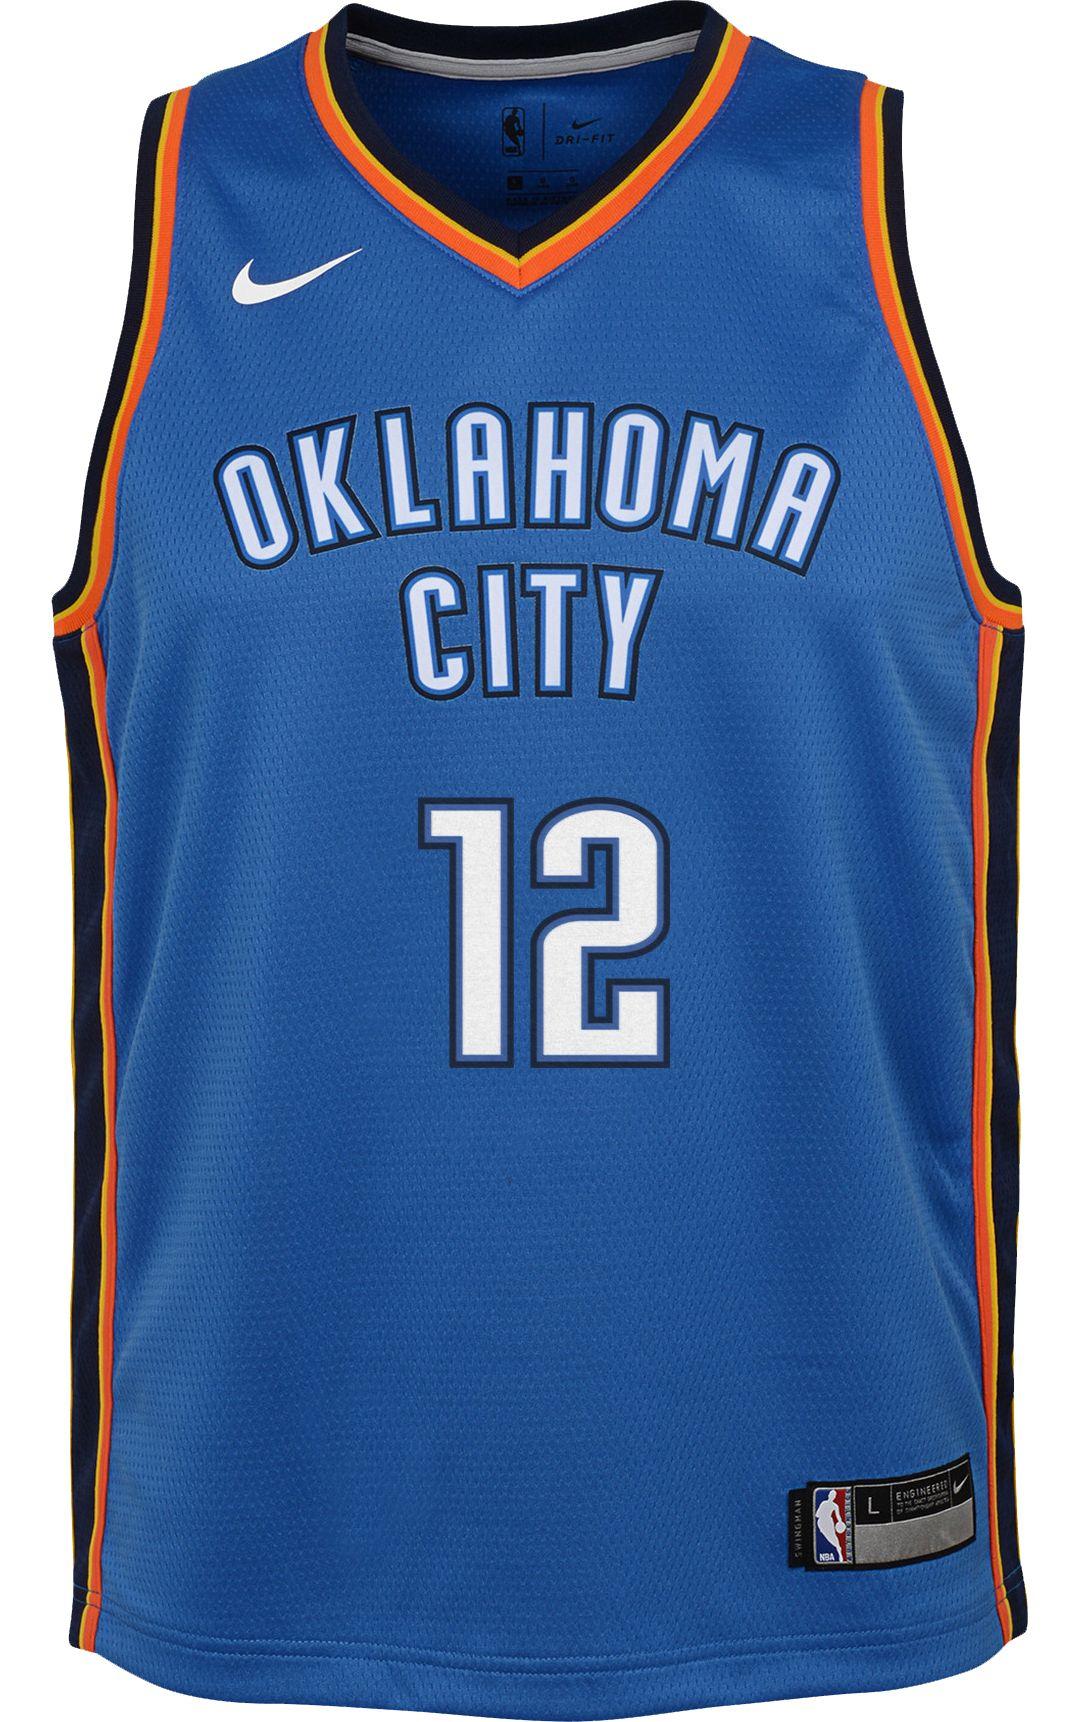 new arrival 43228 39c7e Nike Youth Oklahoma City Thunder Steven Adams #12 Blue Dri-FIT Swingman  Jersey